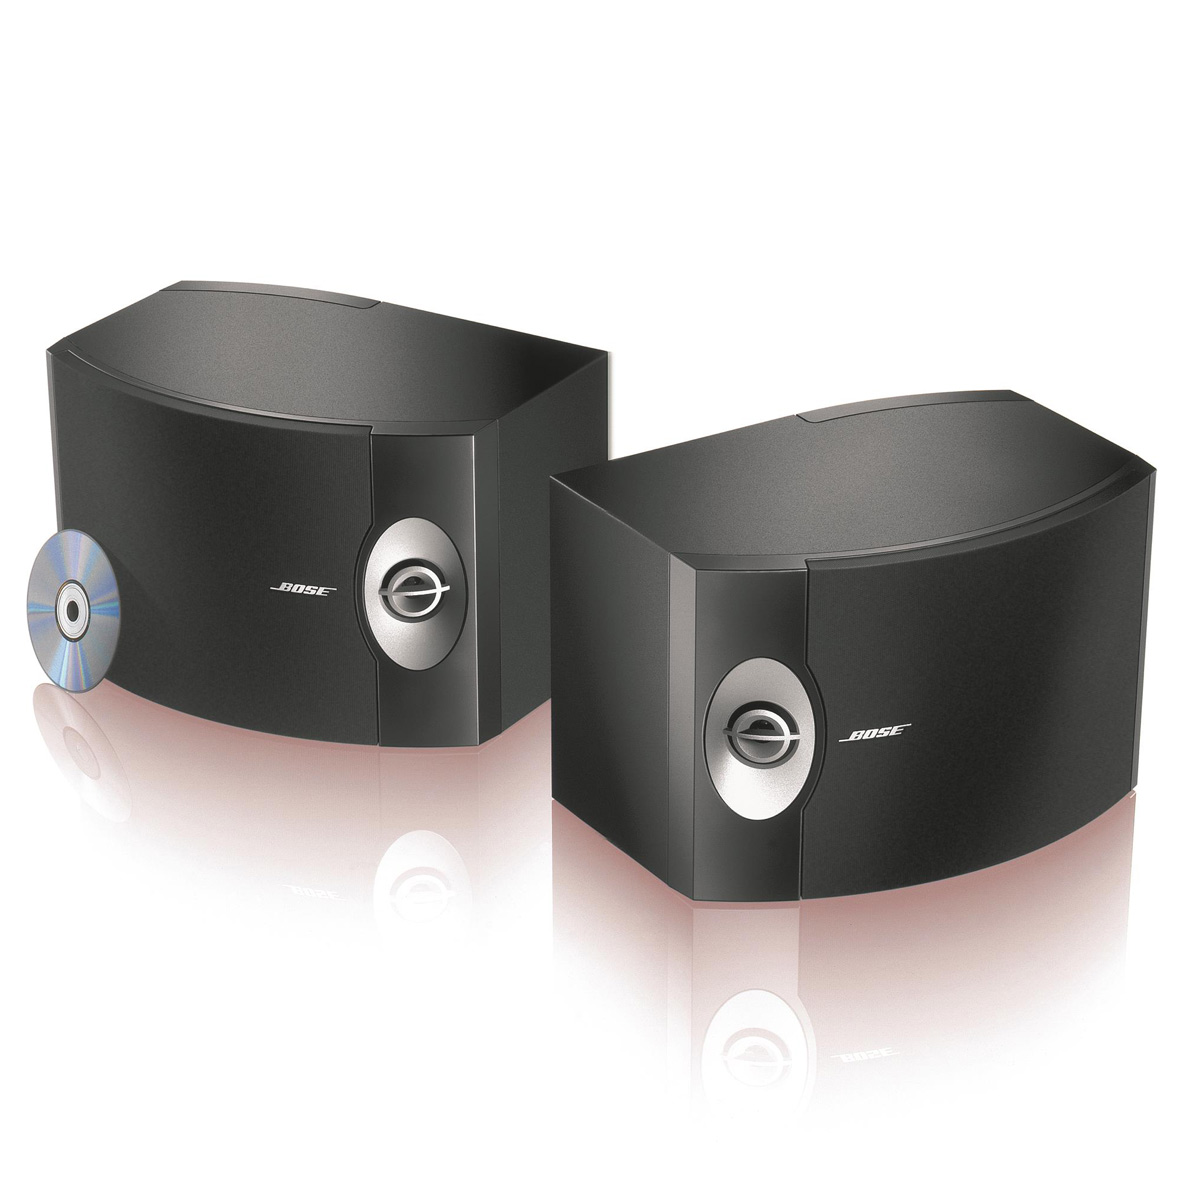 Bose Car Sound System Ebay: Bose 301 Series V Direct/Reflecting Speaker System (Black